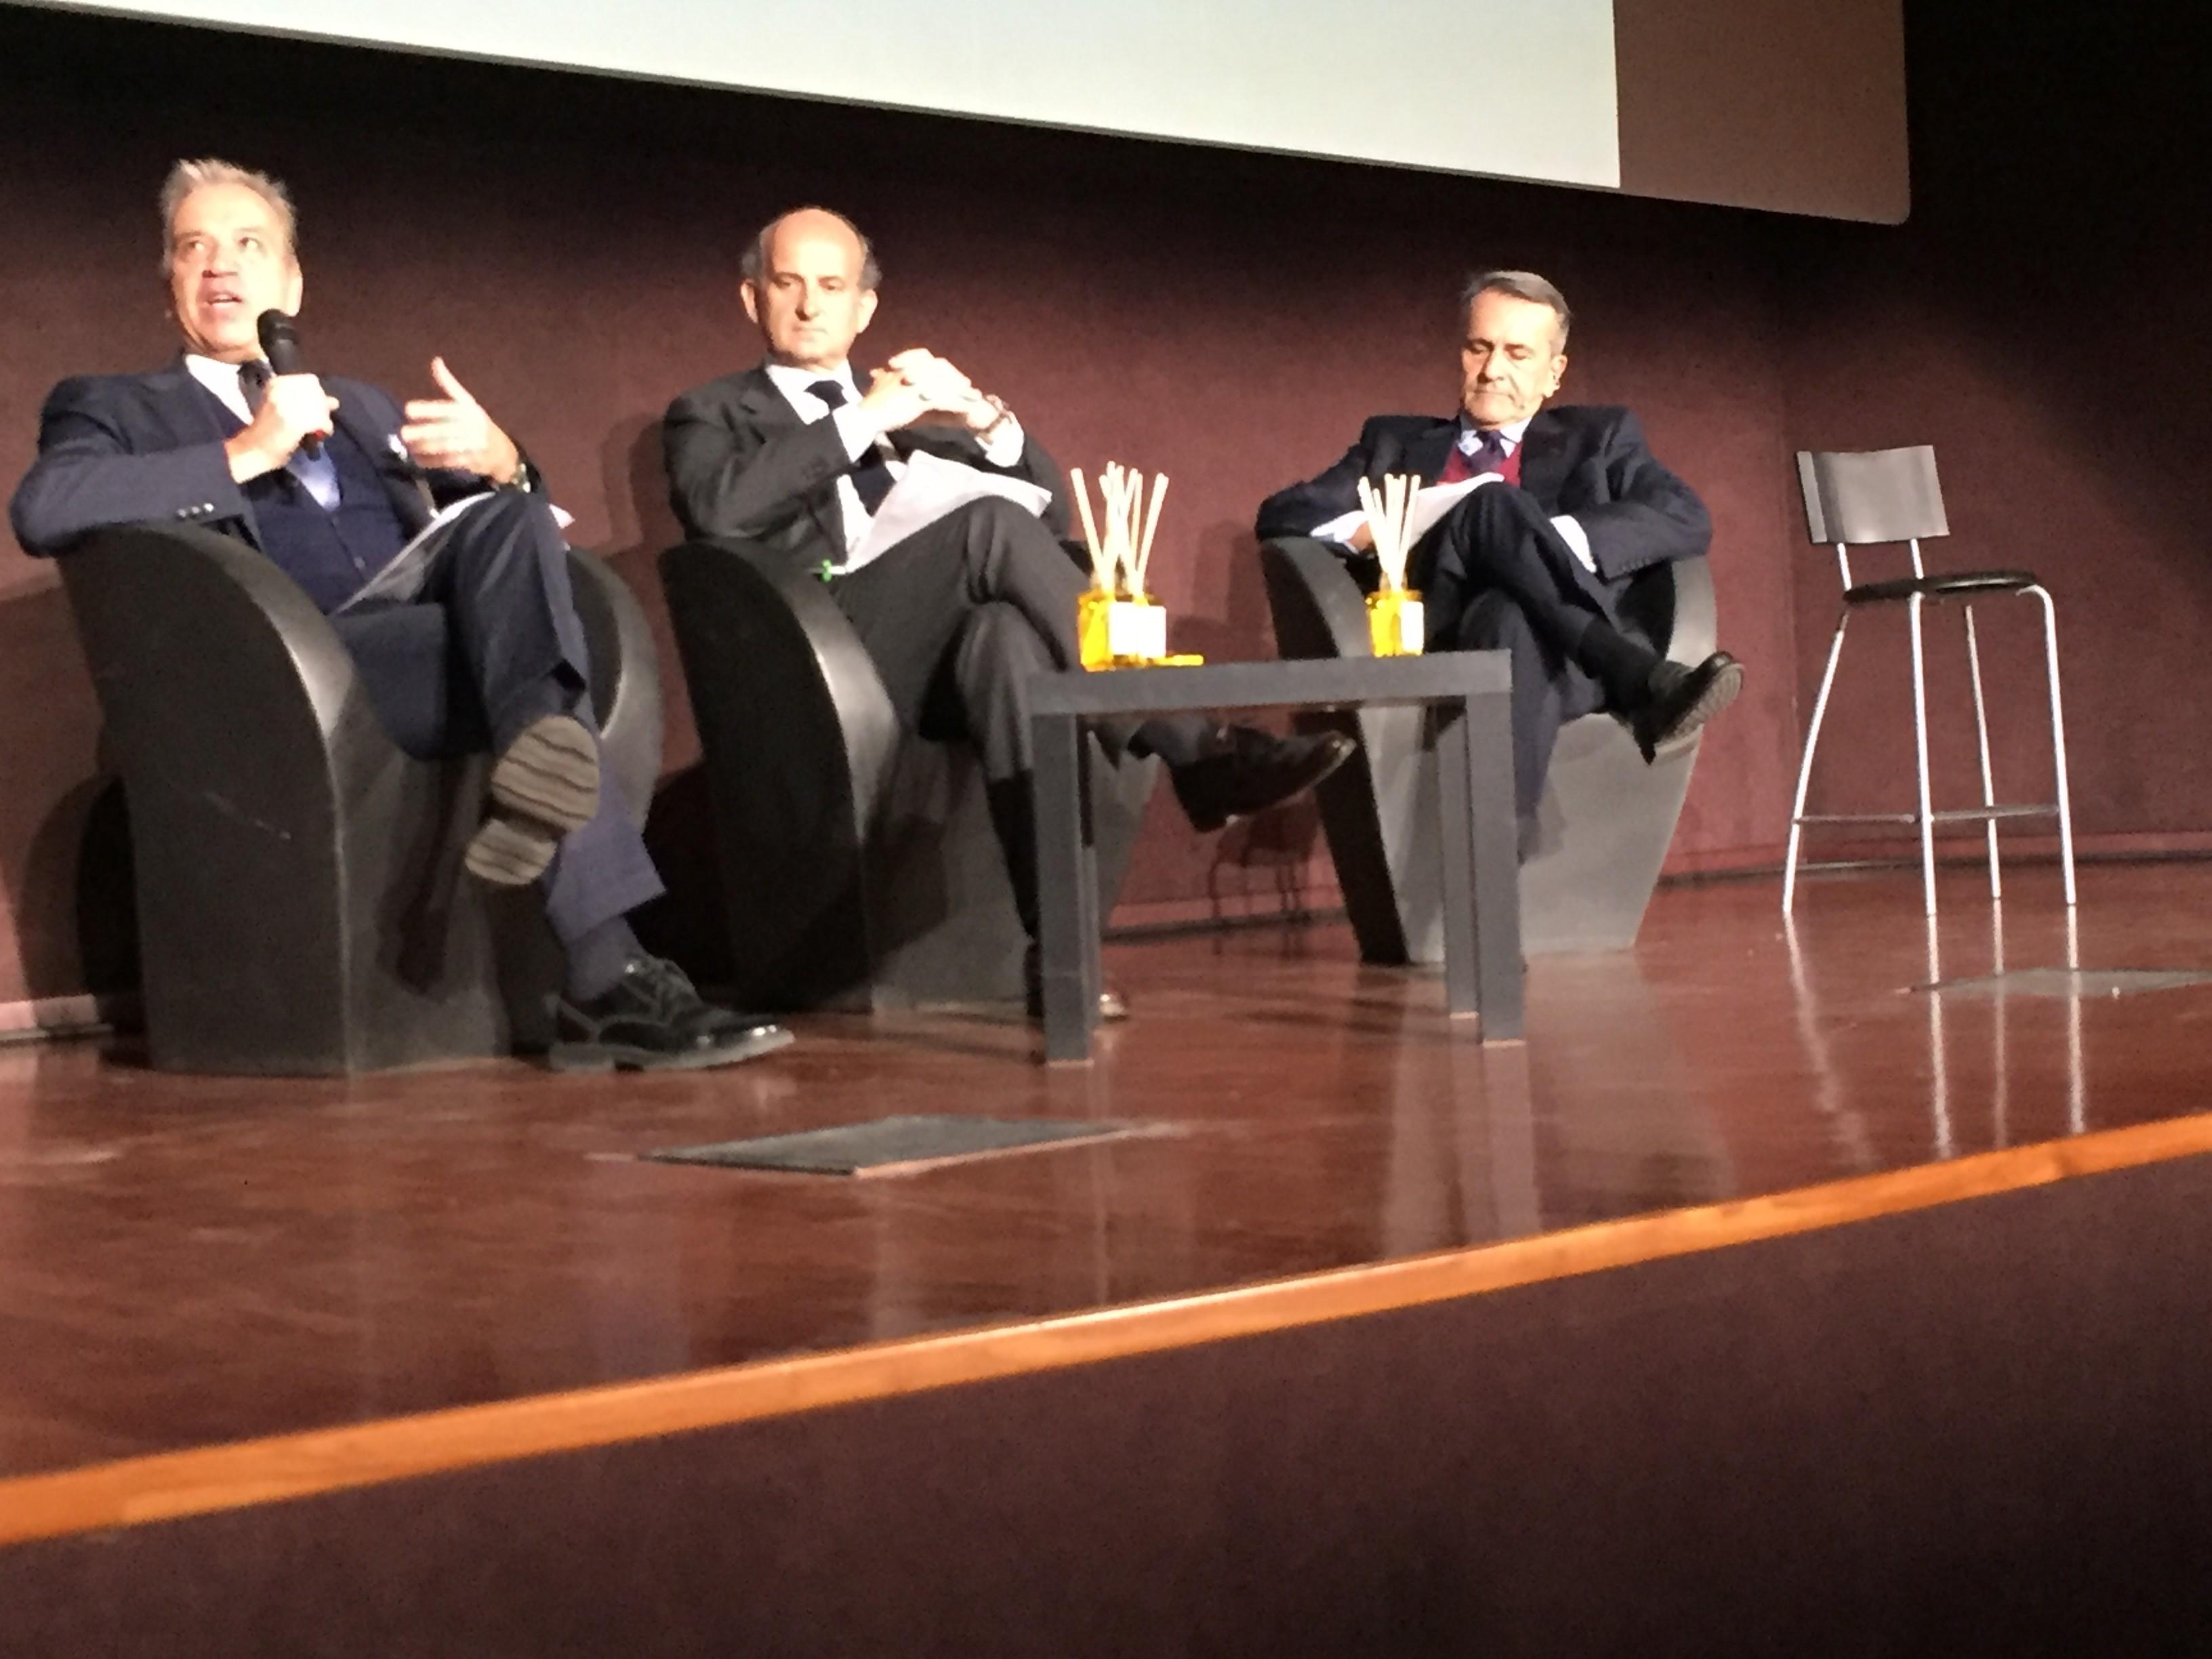 cbf034ffdc Belmond (Lvmh): il turismo è storytelling - MilanoFinanza.it